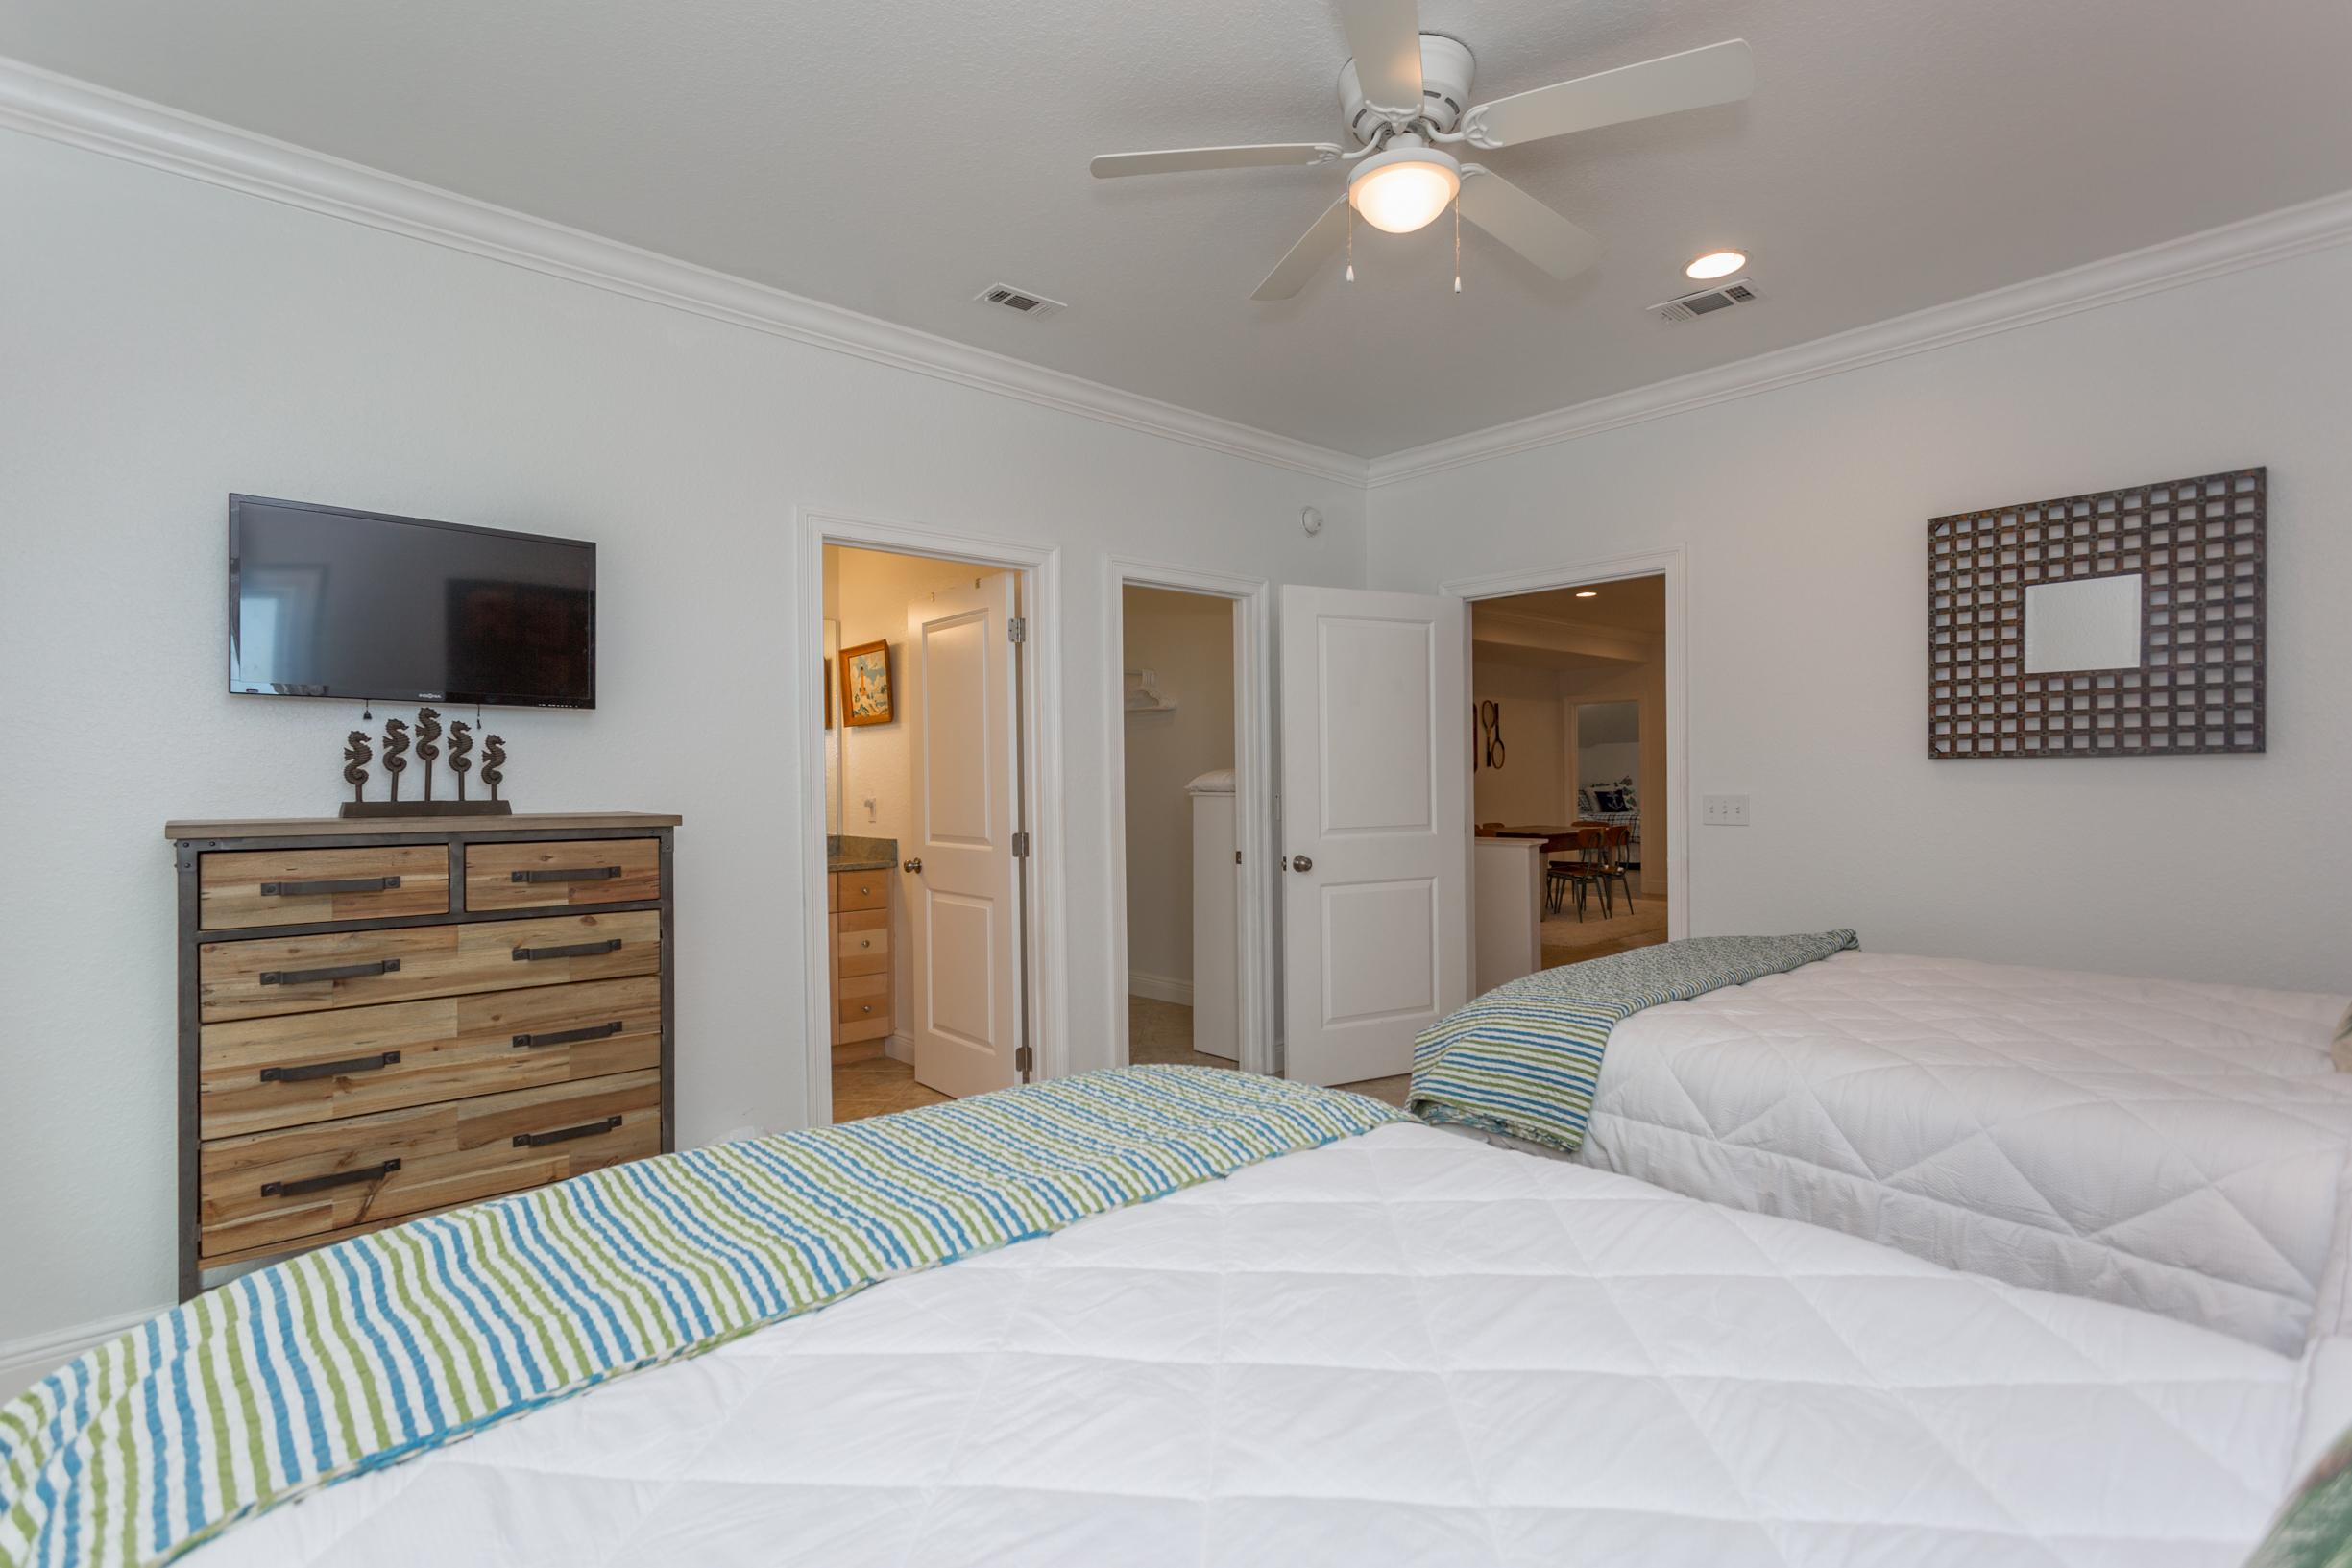 Ariola 1003 - The Starfish House House/Cottage rental in Pensacola Beach House Rentals in Pensacola Beach Florida - #52